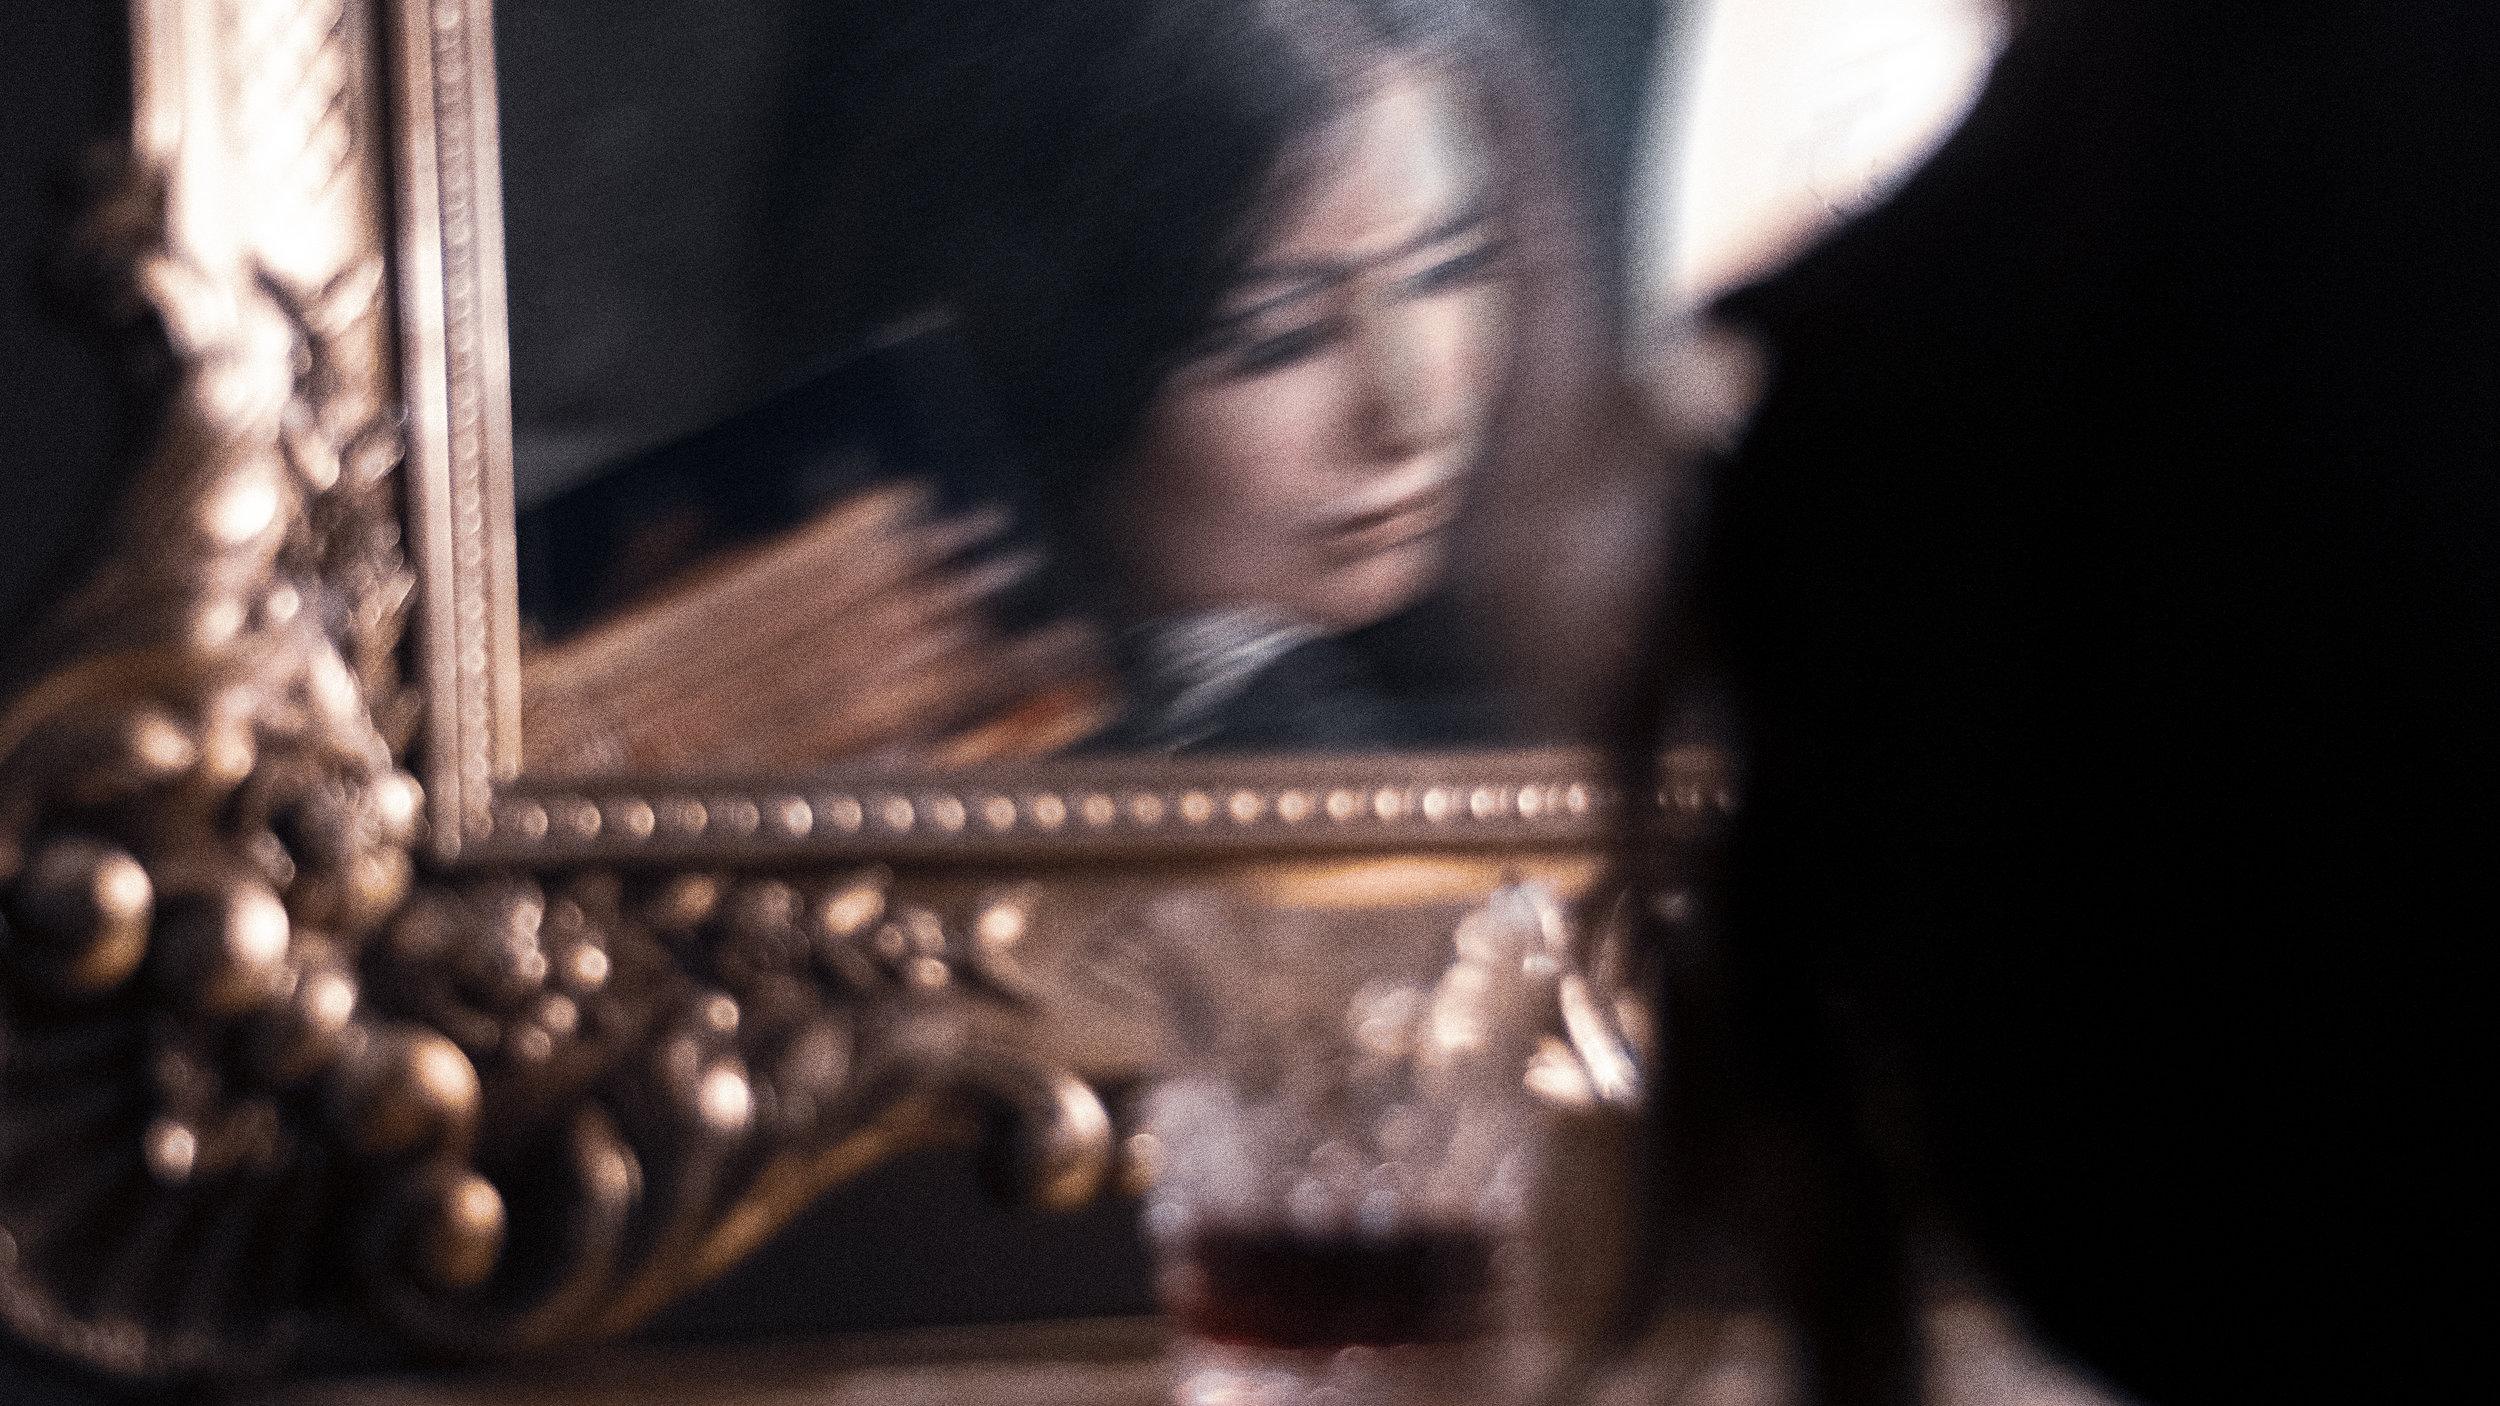 Ritual---Florence-Mirror-2-Blurry_WEB.jpg